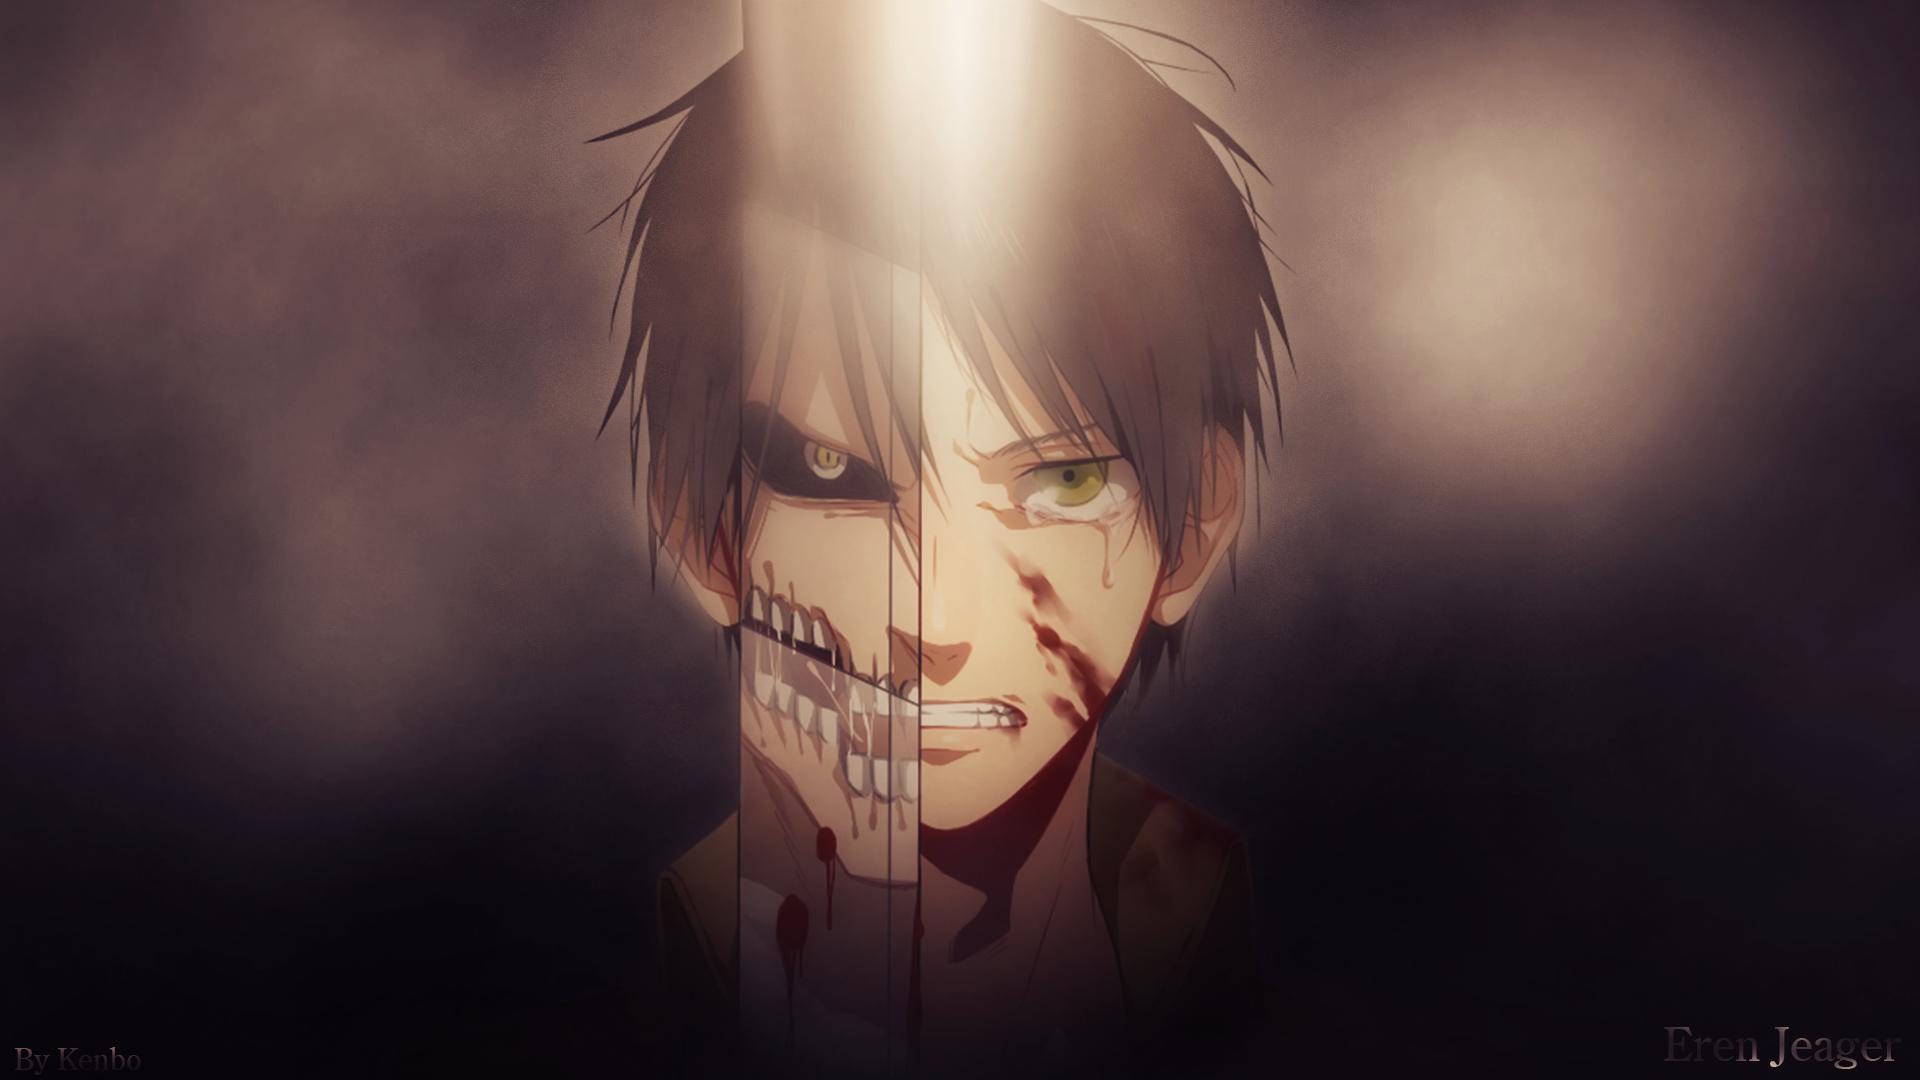 Shingeki No Kyojin Eren Jeager Anime Manga Anime Boys Wallpaper Resolution 1920x1080 Id 170467 Wallha Com